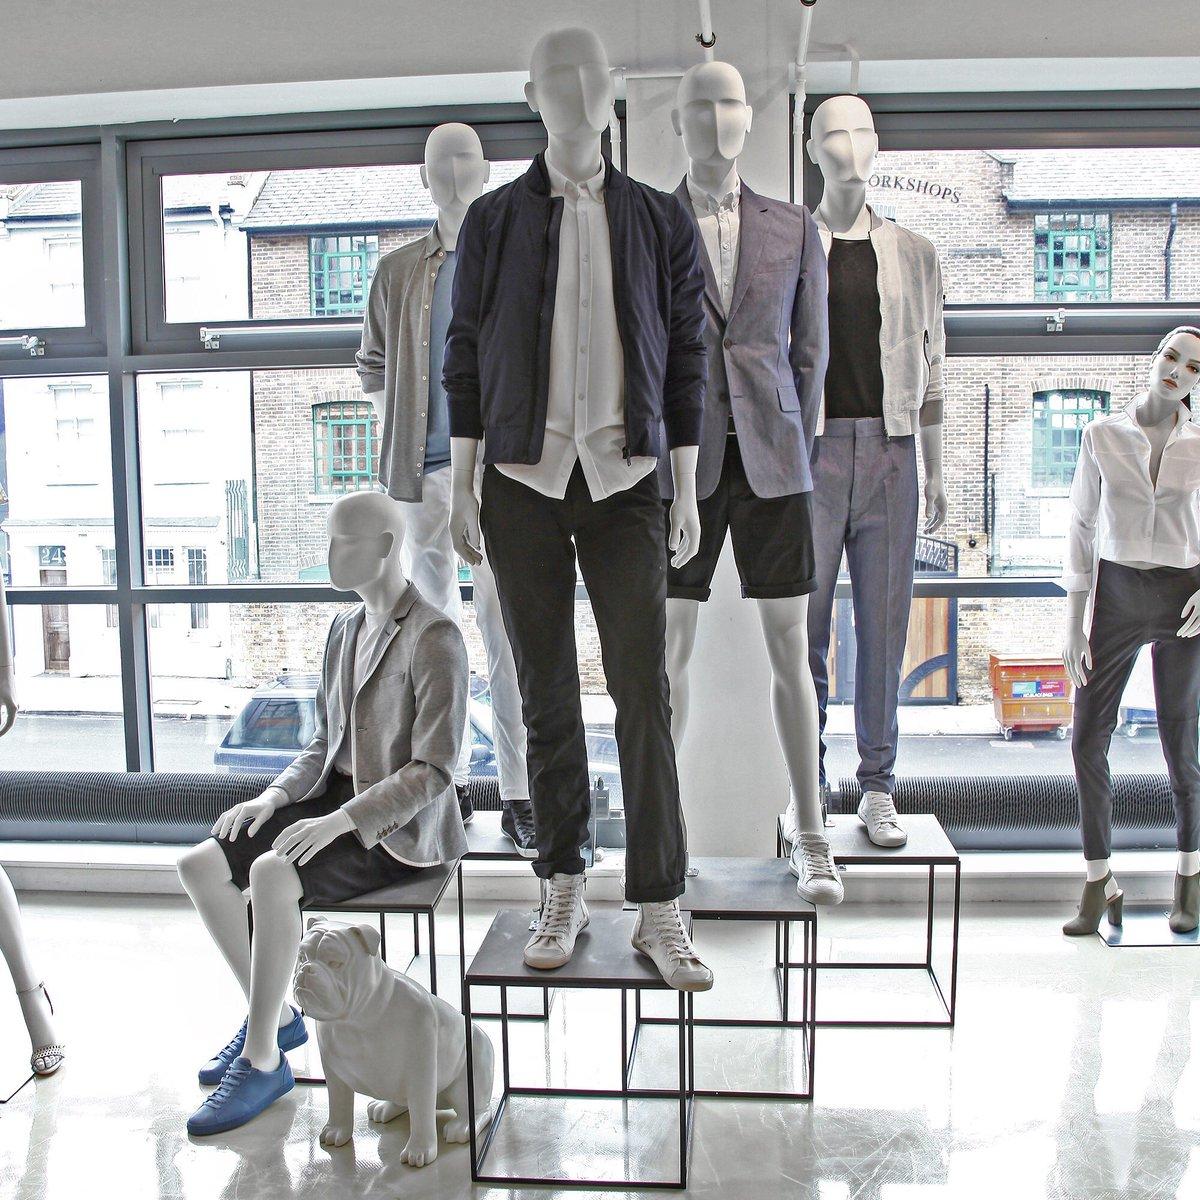 Profile Man in the new look London showroom #mannequin #mannequins #display #vm #london #visualmerchandising #vitrine #nyc#fashion #dubai<br>http://pic.twitter.com/spTflolwBu